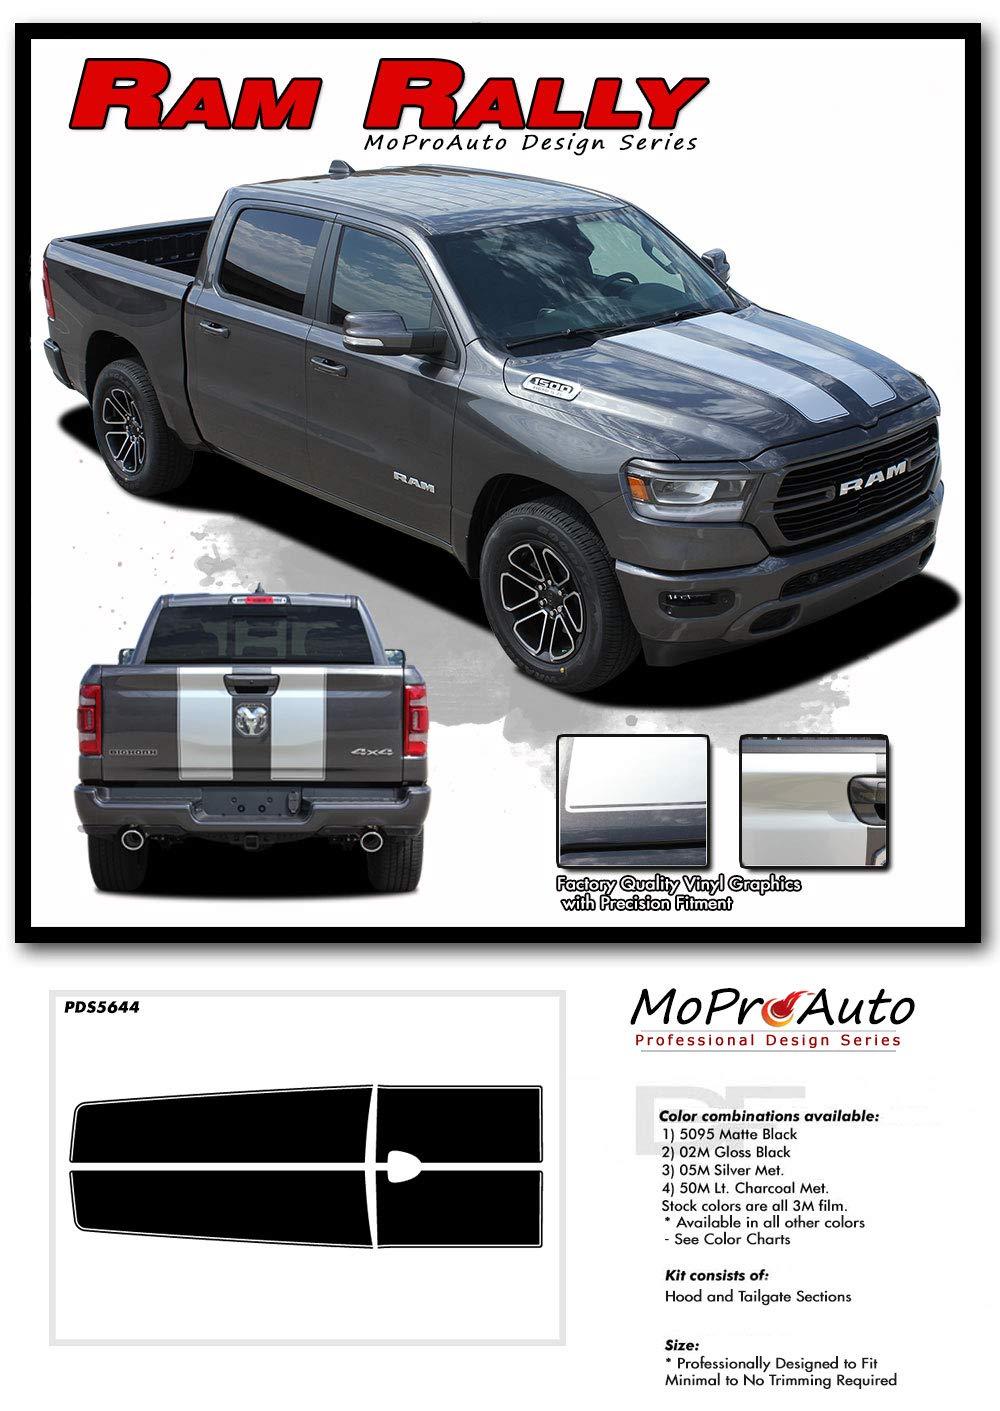 Amazon com: MoProAuto Pro Design Series RAM Rally : 2019 2020 Dodge